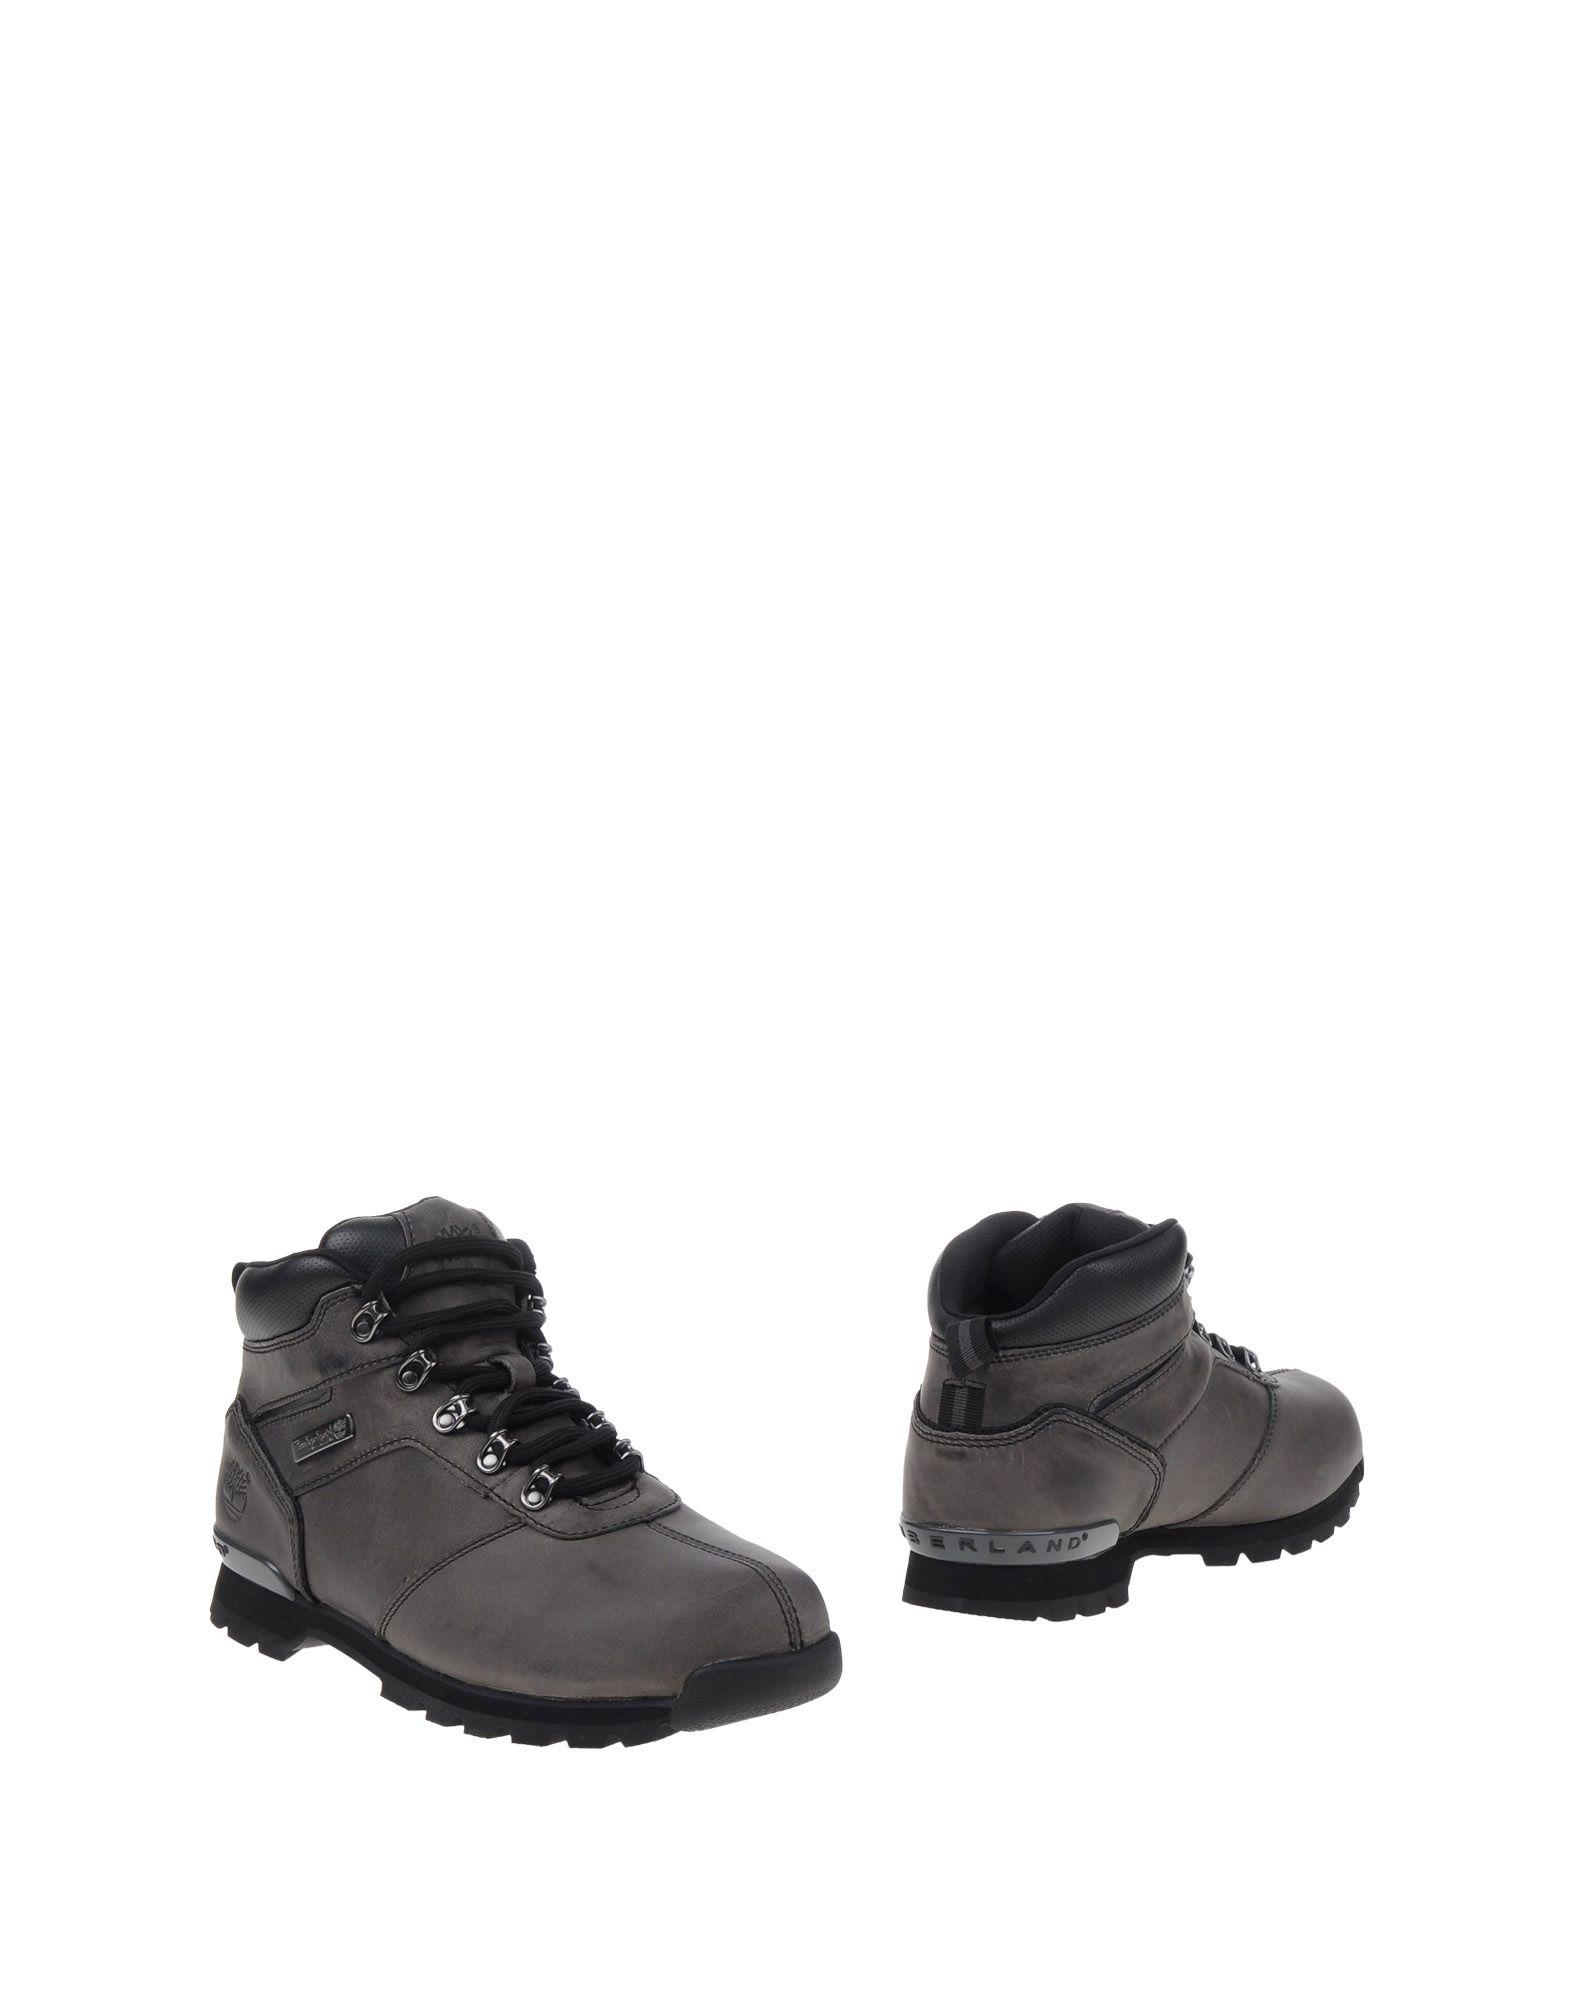 Timberland 11025709IS Stiefelette Herren  11025709IS Timberland Gute Qualität beliebte Schuhe b97b48